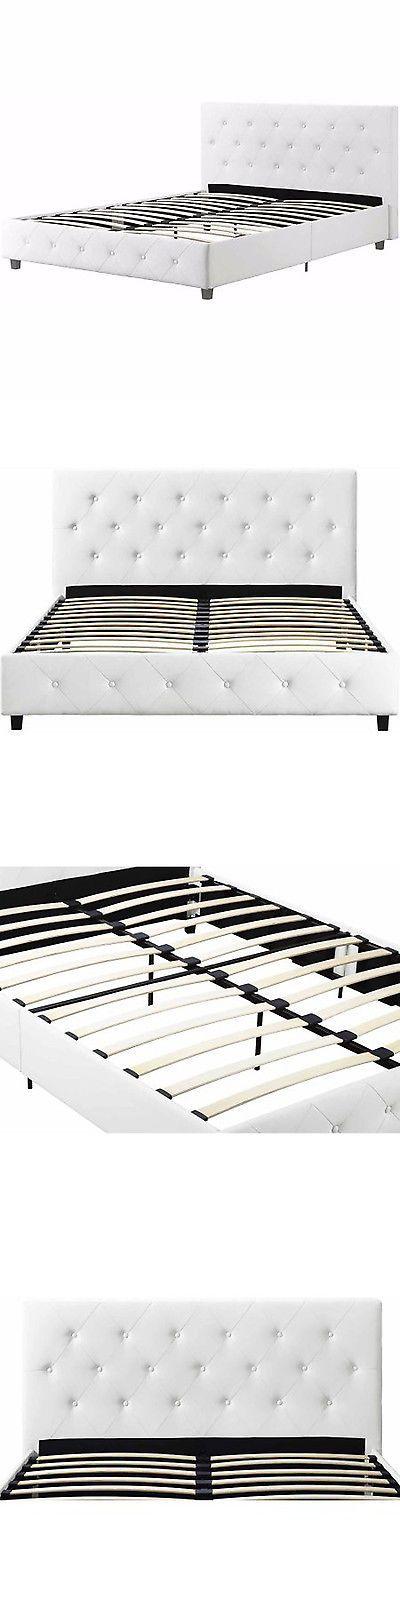 beds and bed frames 175758 bed frame queen size platform upholstered bedroom furniture tufted headboard - Tufted Bed Frame Queen